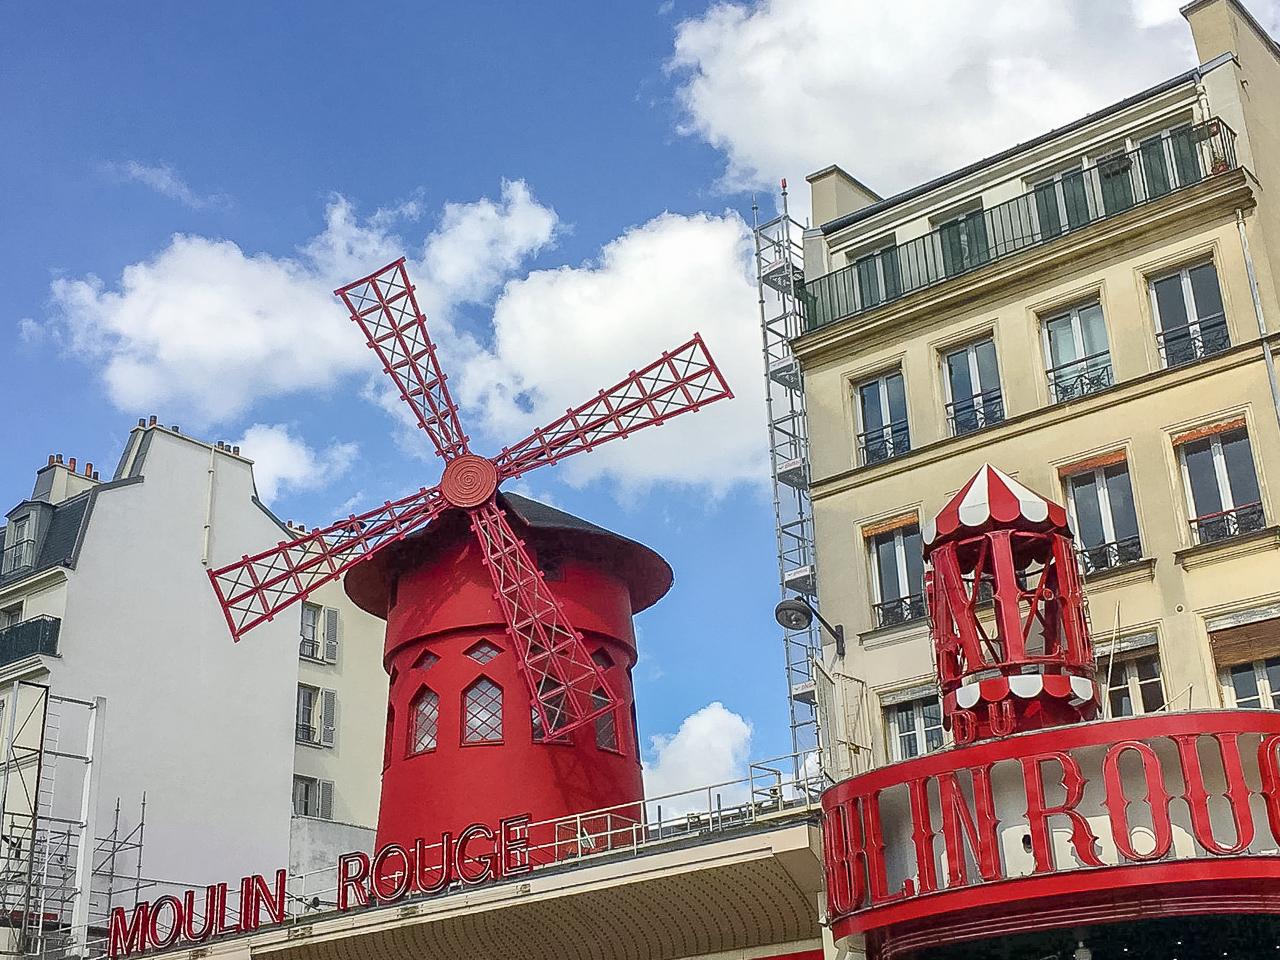 Pariisi, Montmartre, Moulin Rouge